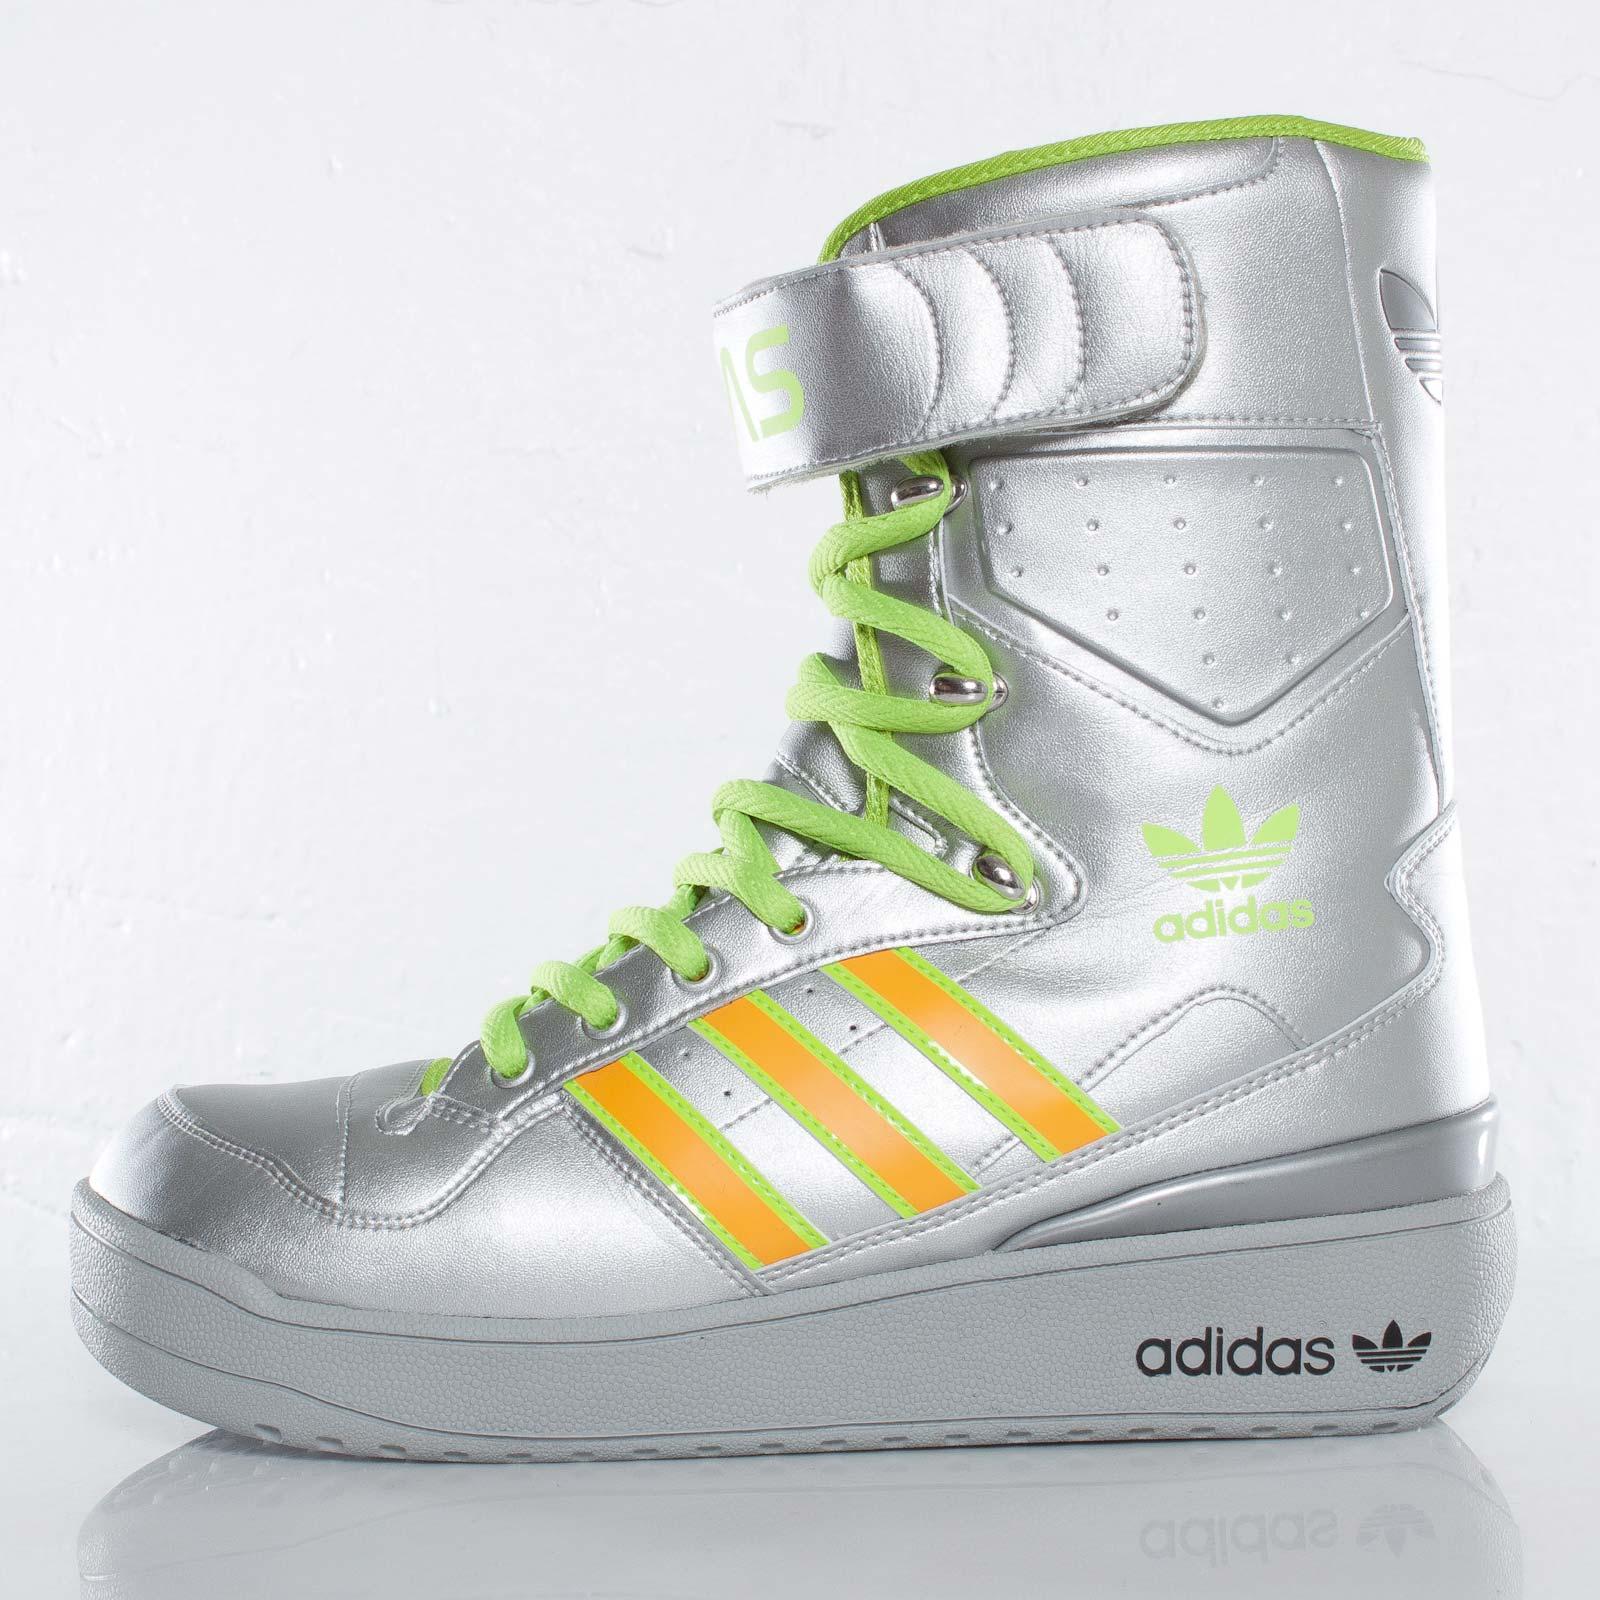 80%OFF adidas Originals by Jeremy Scott JS Snow - molndalsrev.se 6bc80a1cd